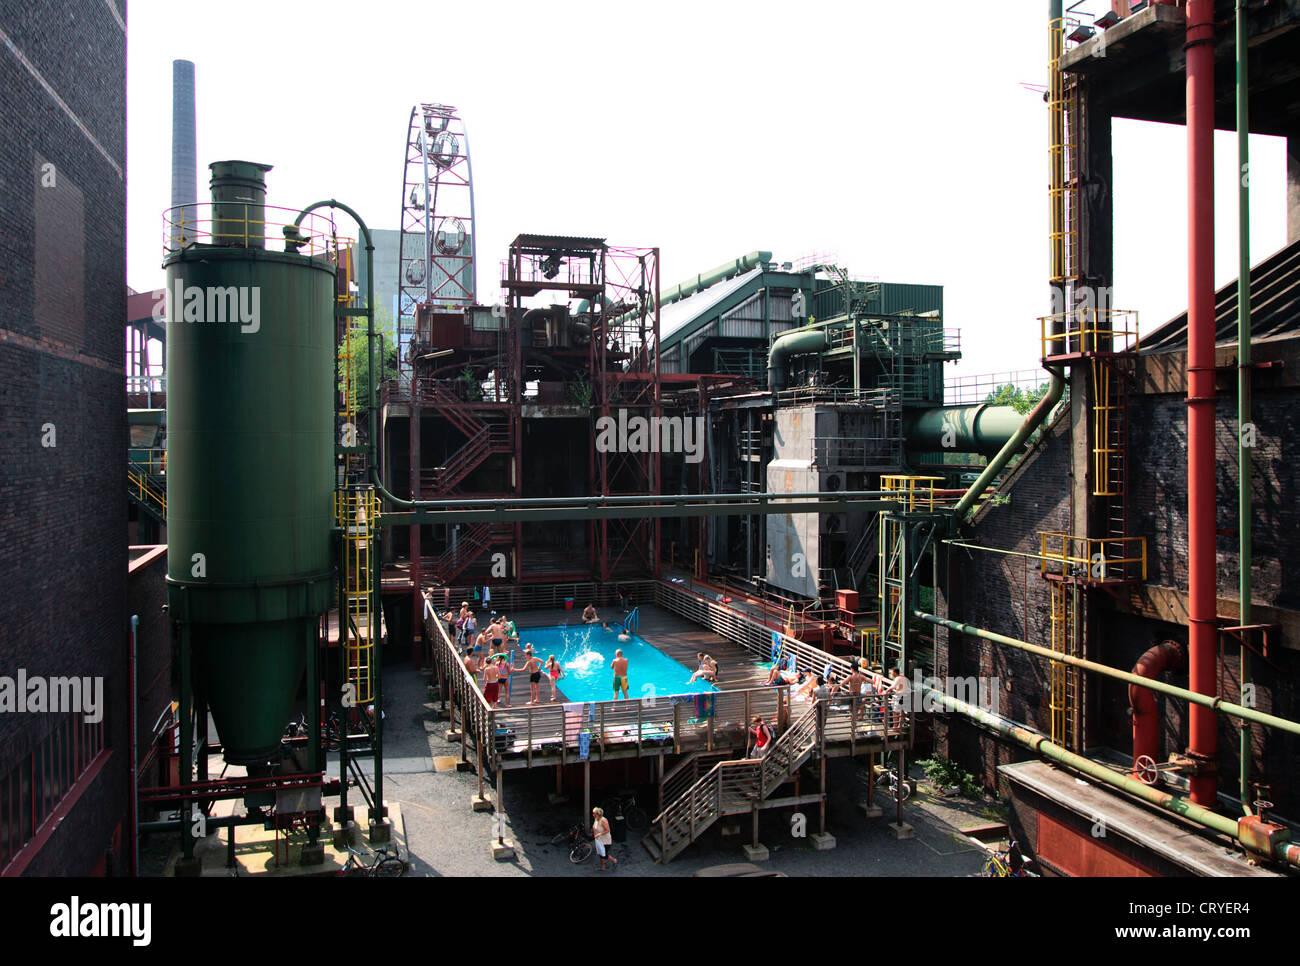 Food, pool plant Zollverein - Stock Image